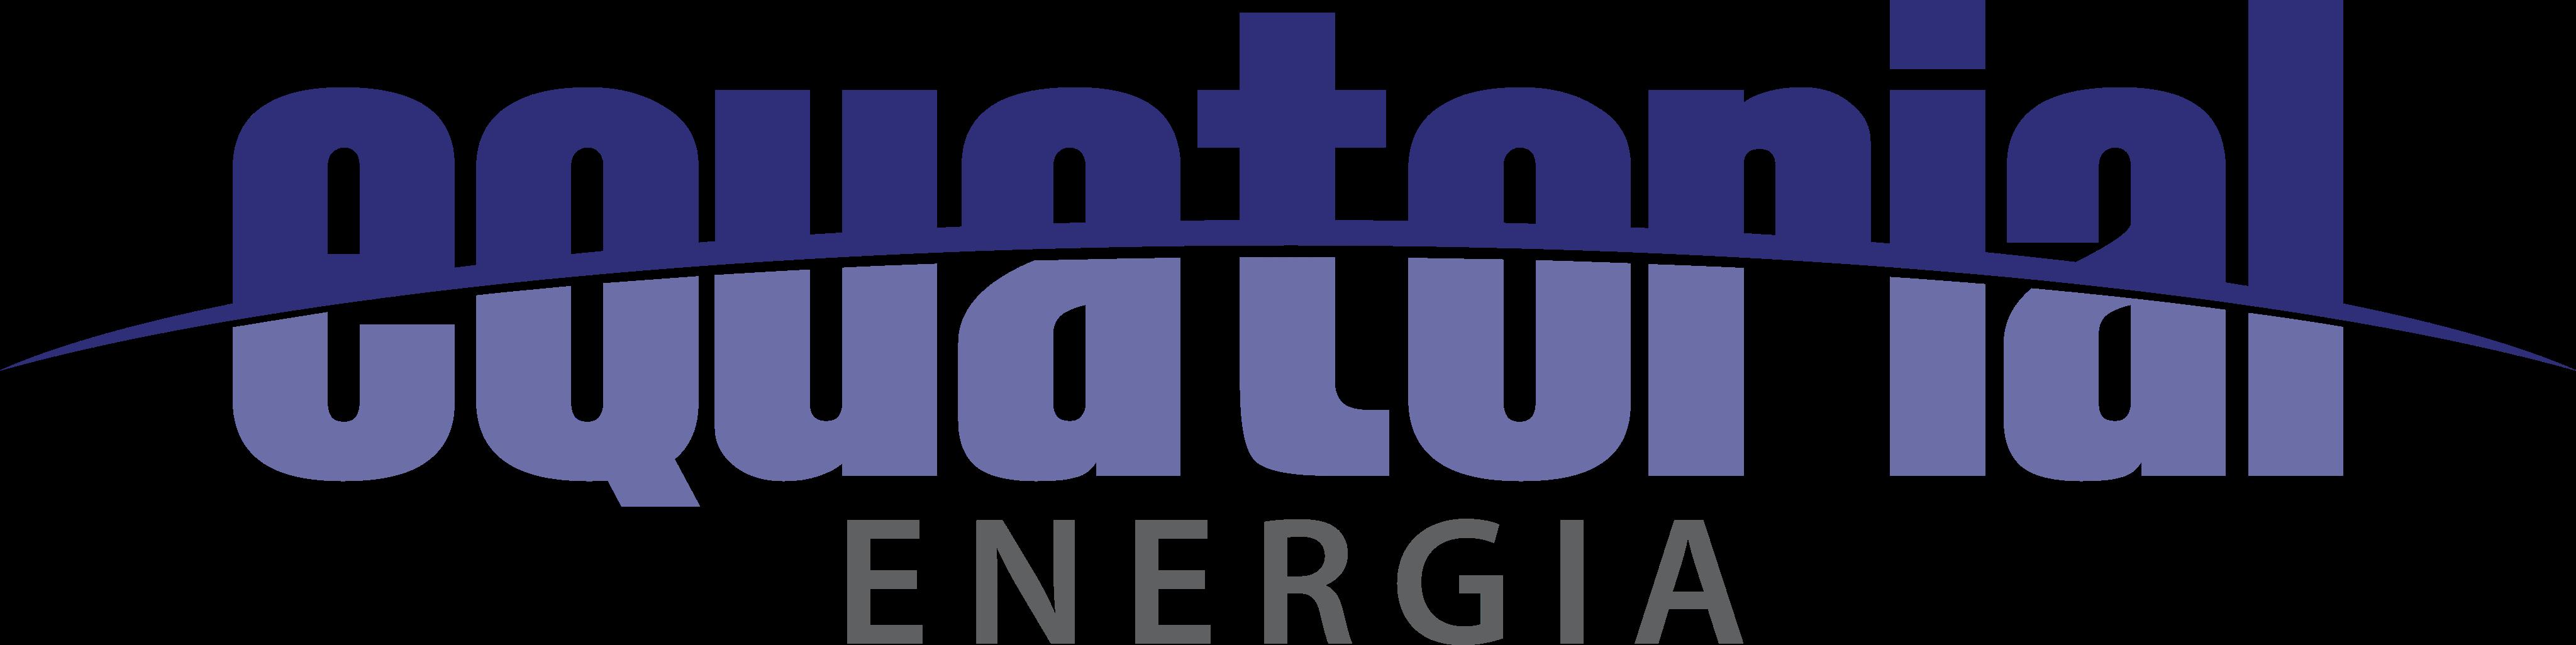 Equatorial Energia Logo.